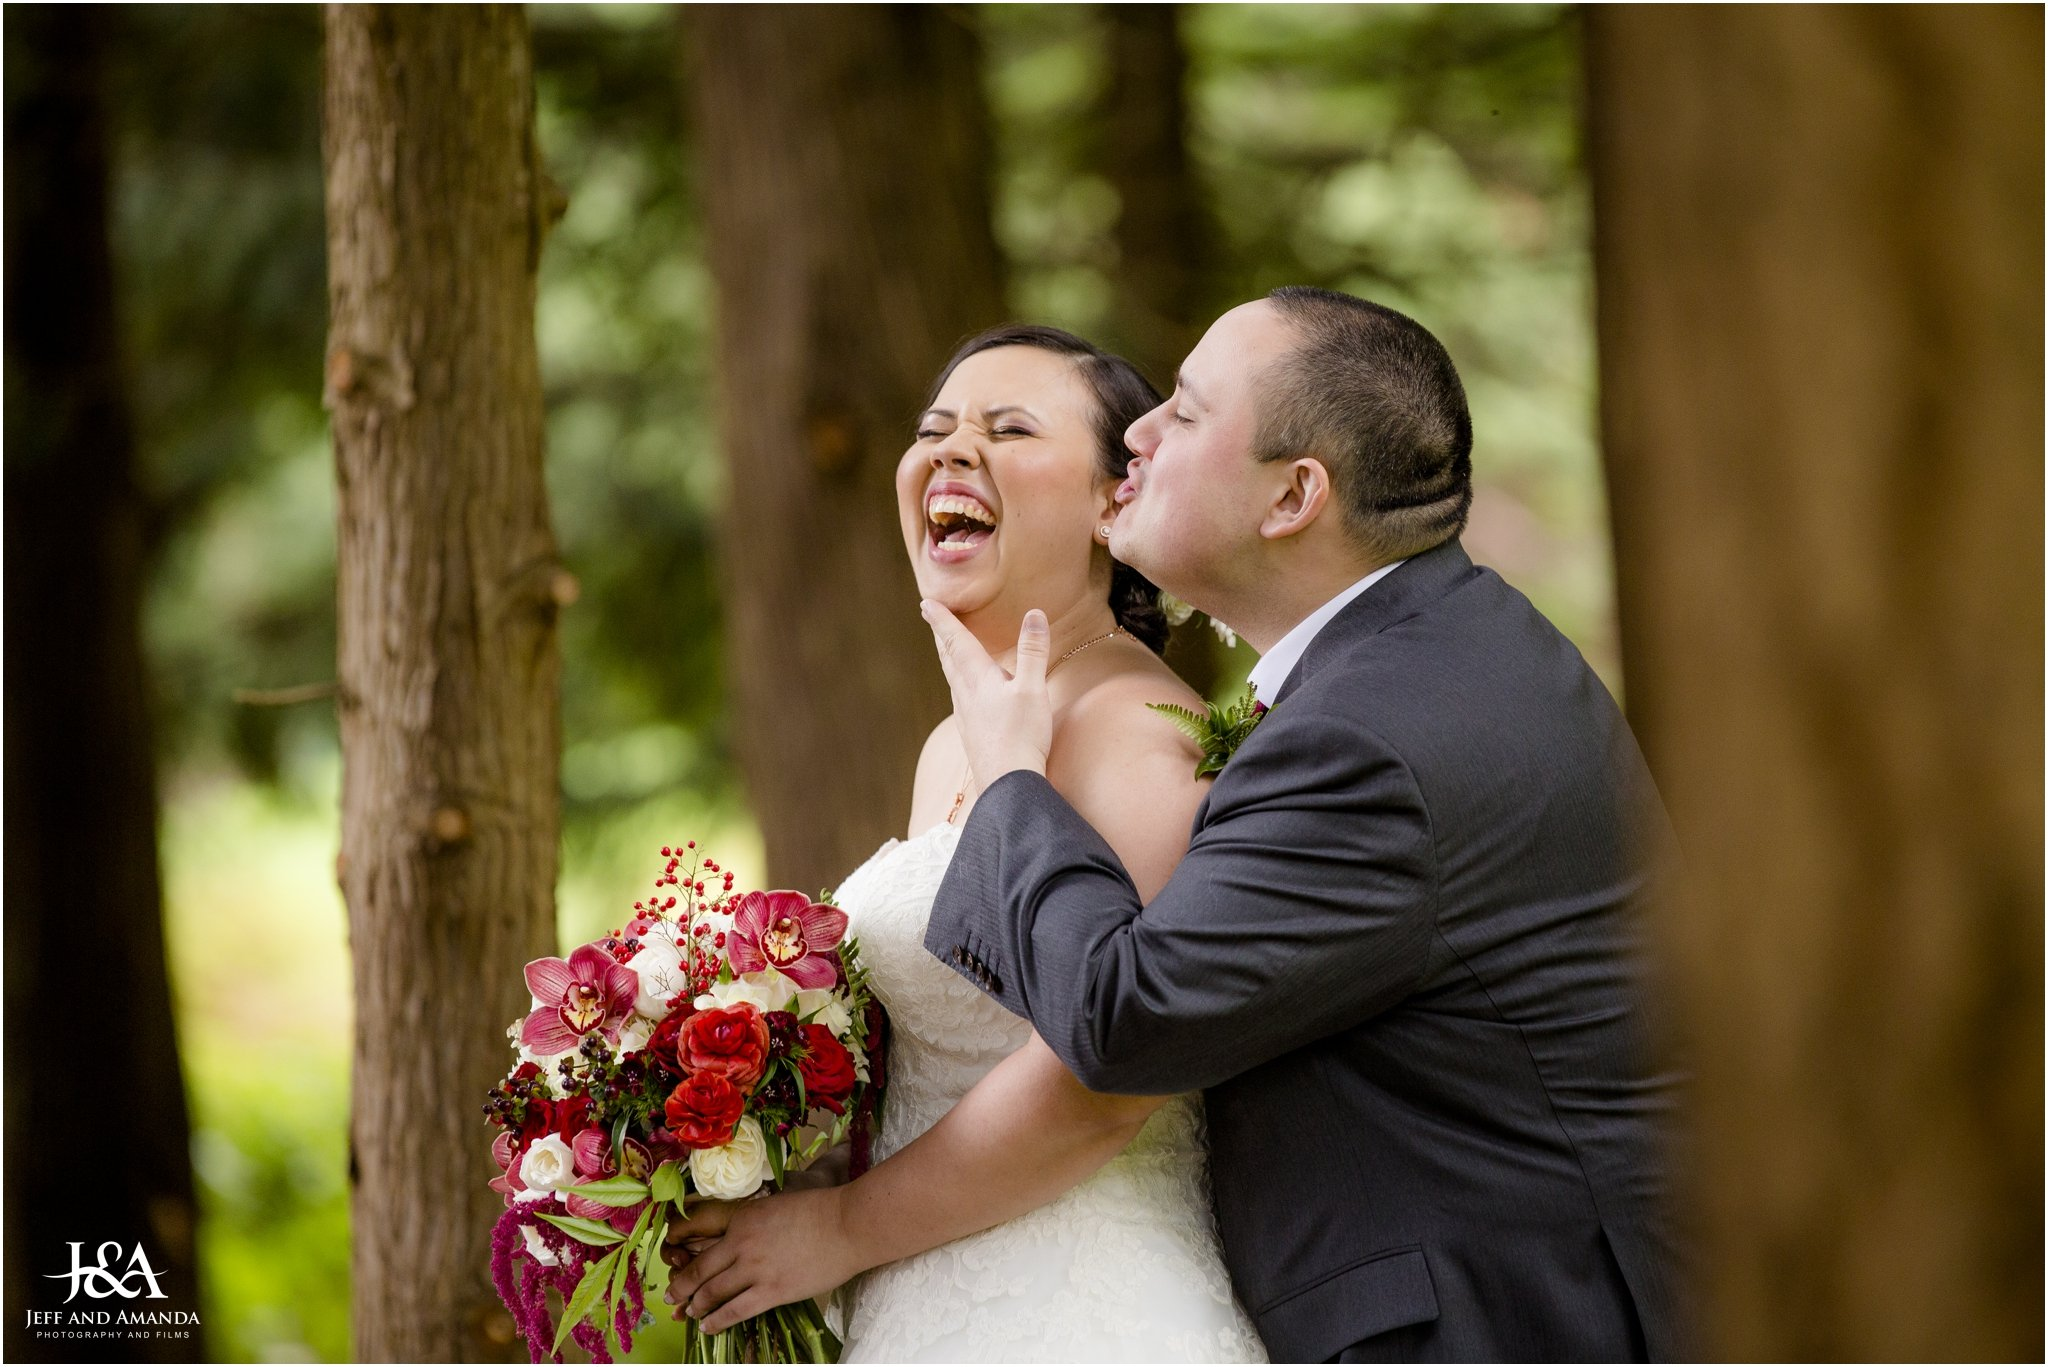 Dave and Kari s Wedding-Facebook Ready-0157.jpg